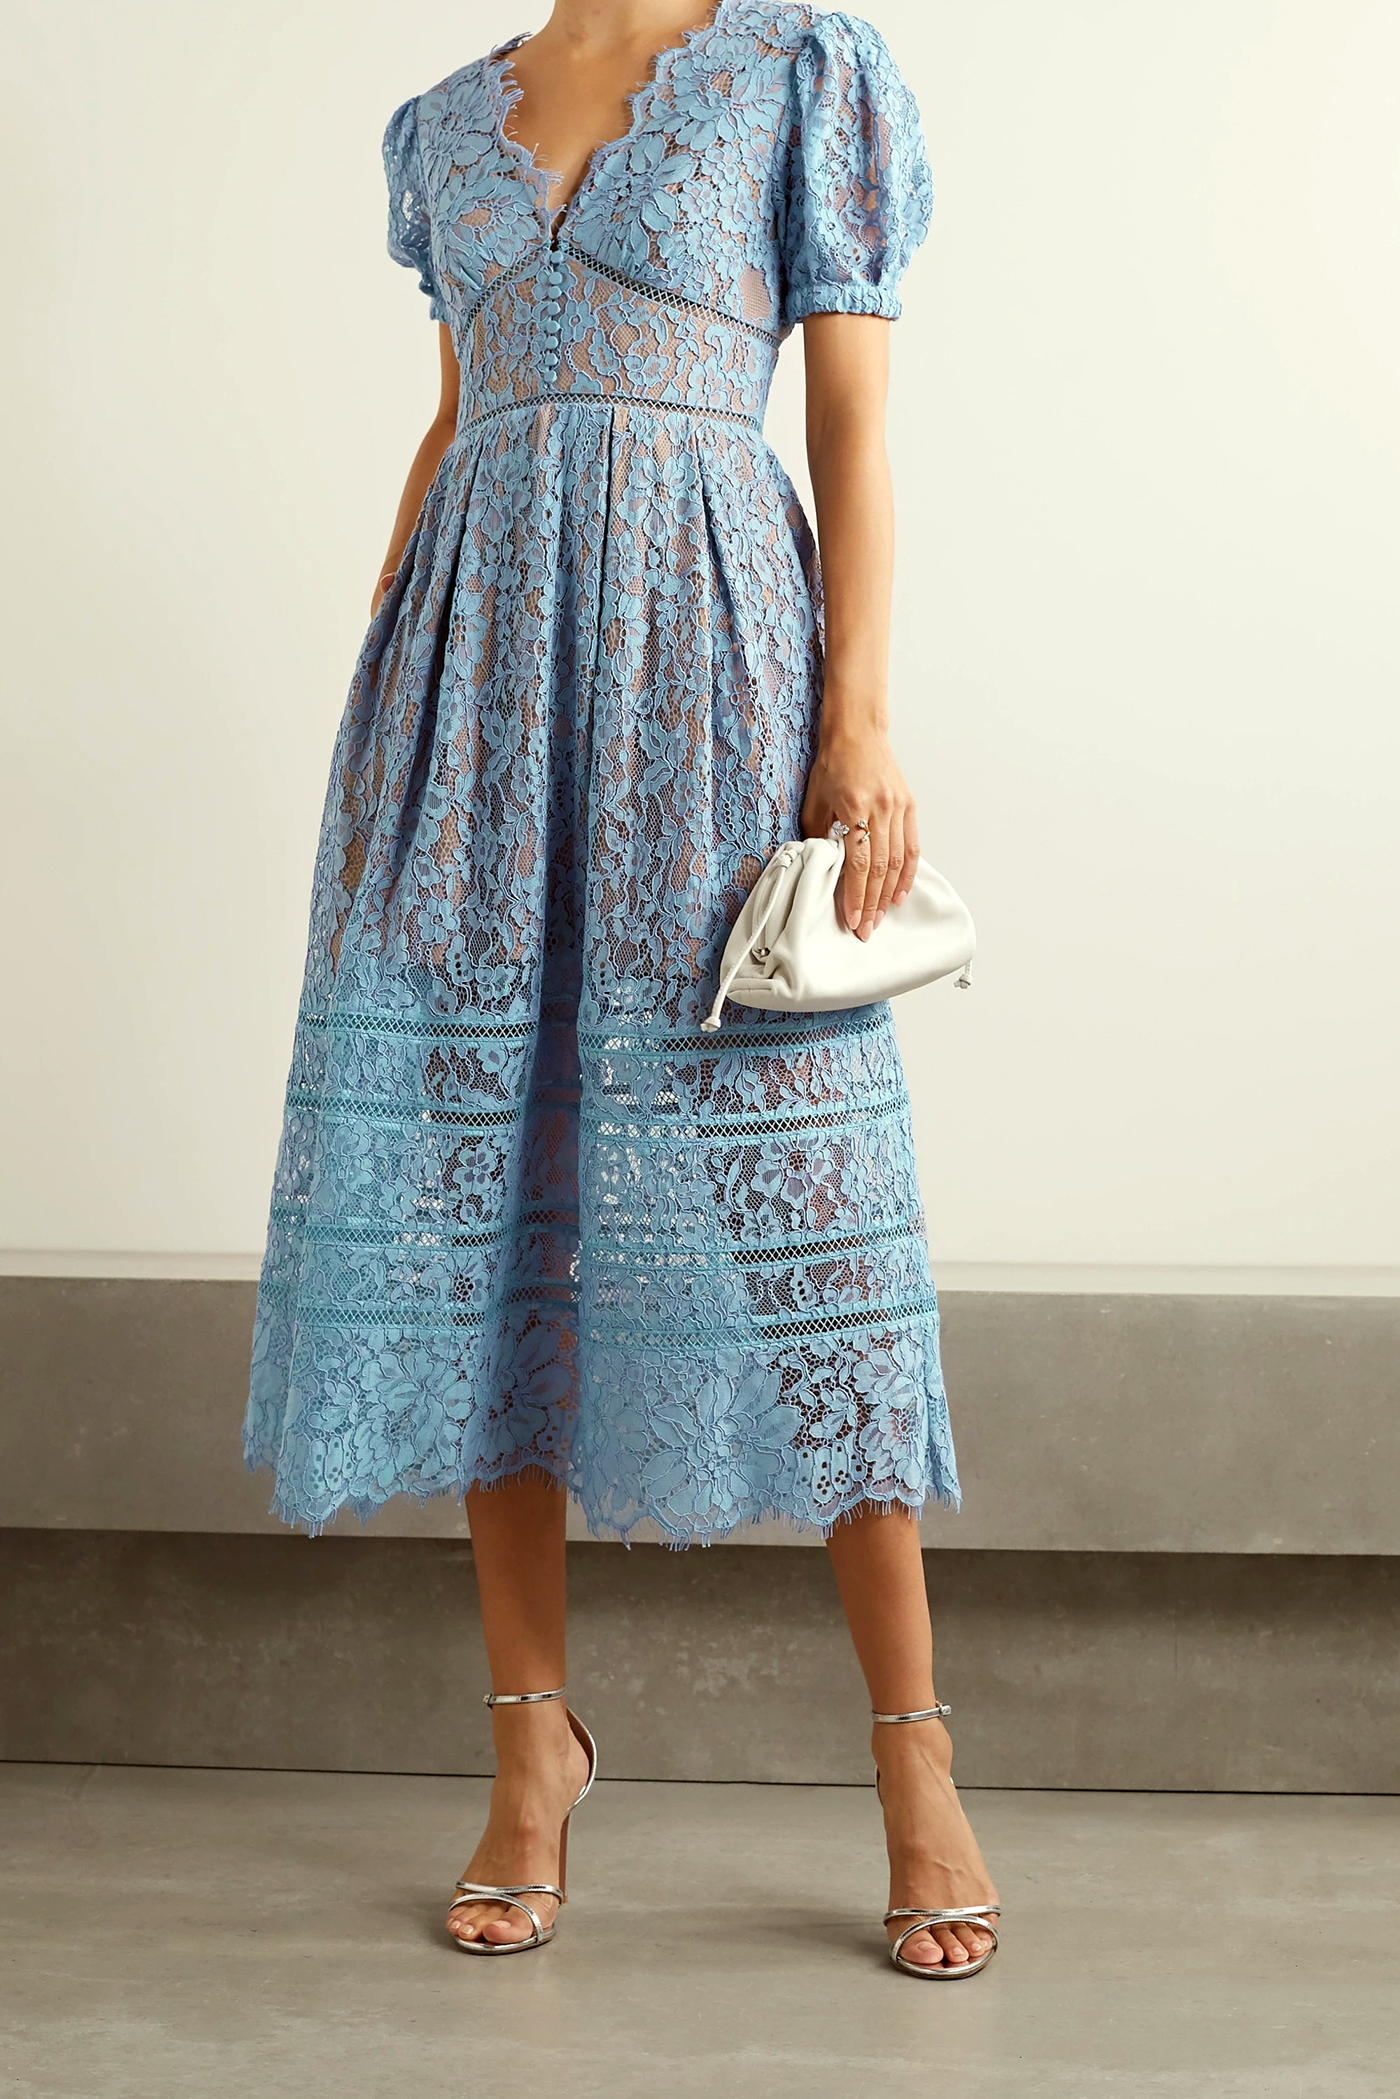 Blue Daphne Bridgerton-Inspired Dress